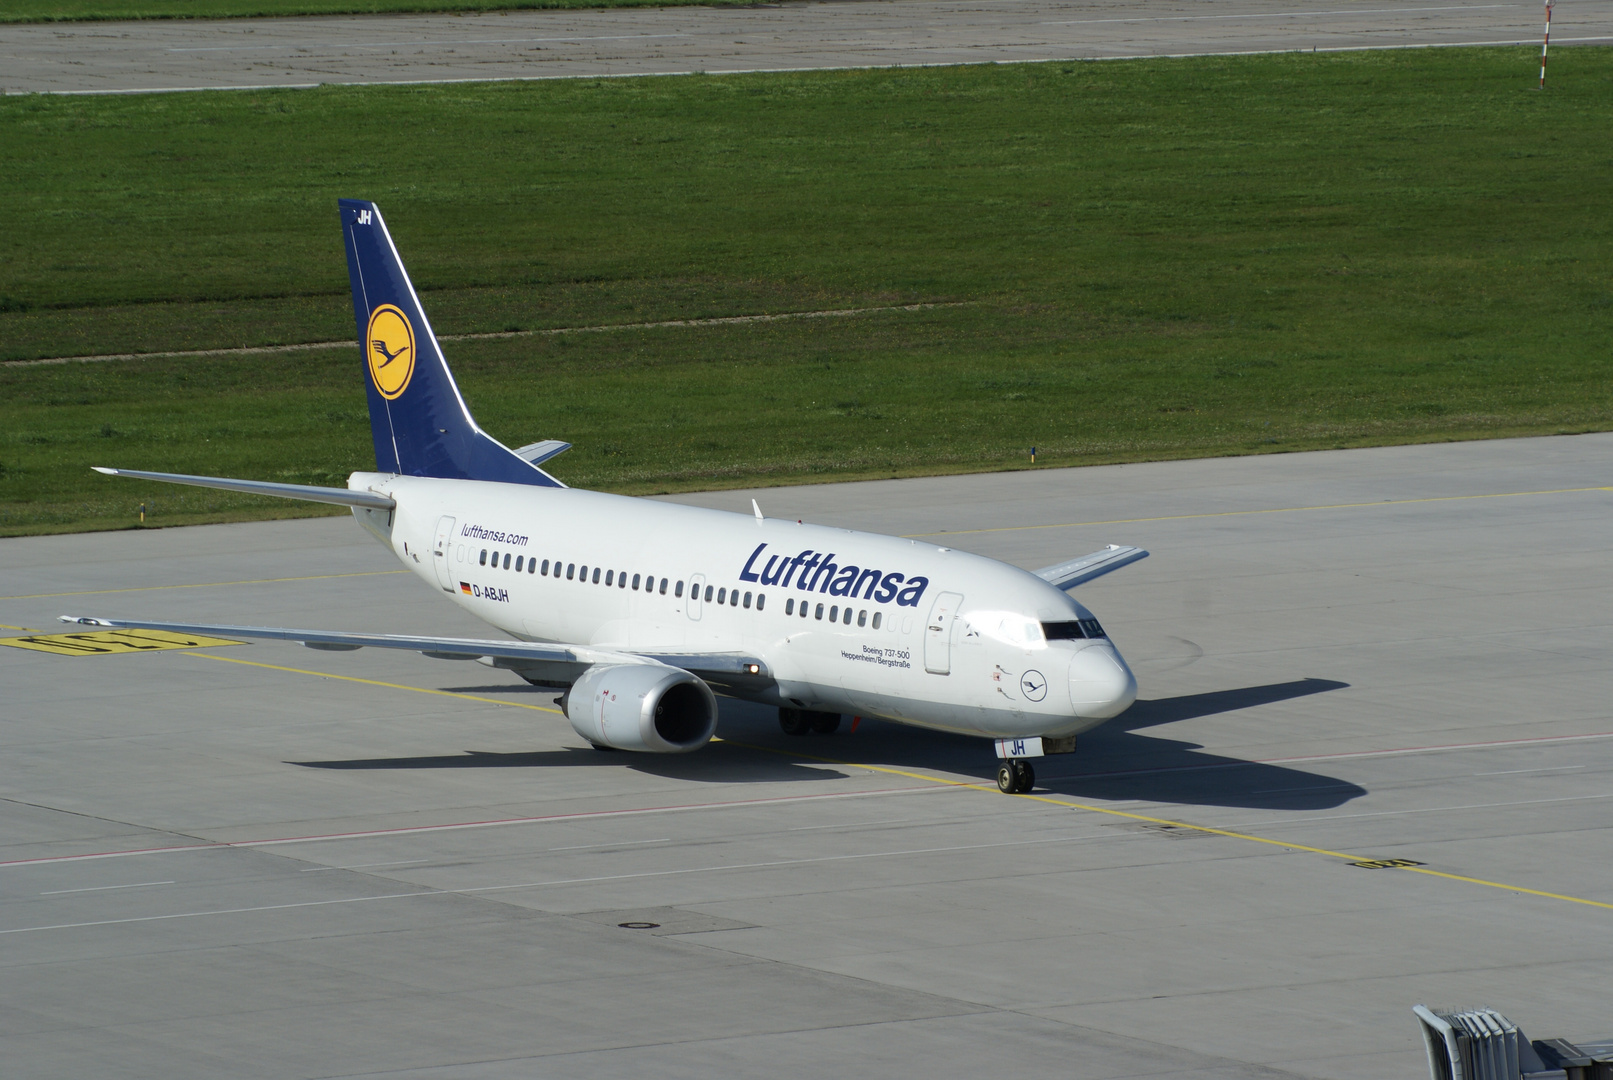 Lufthansa B737/500